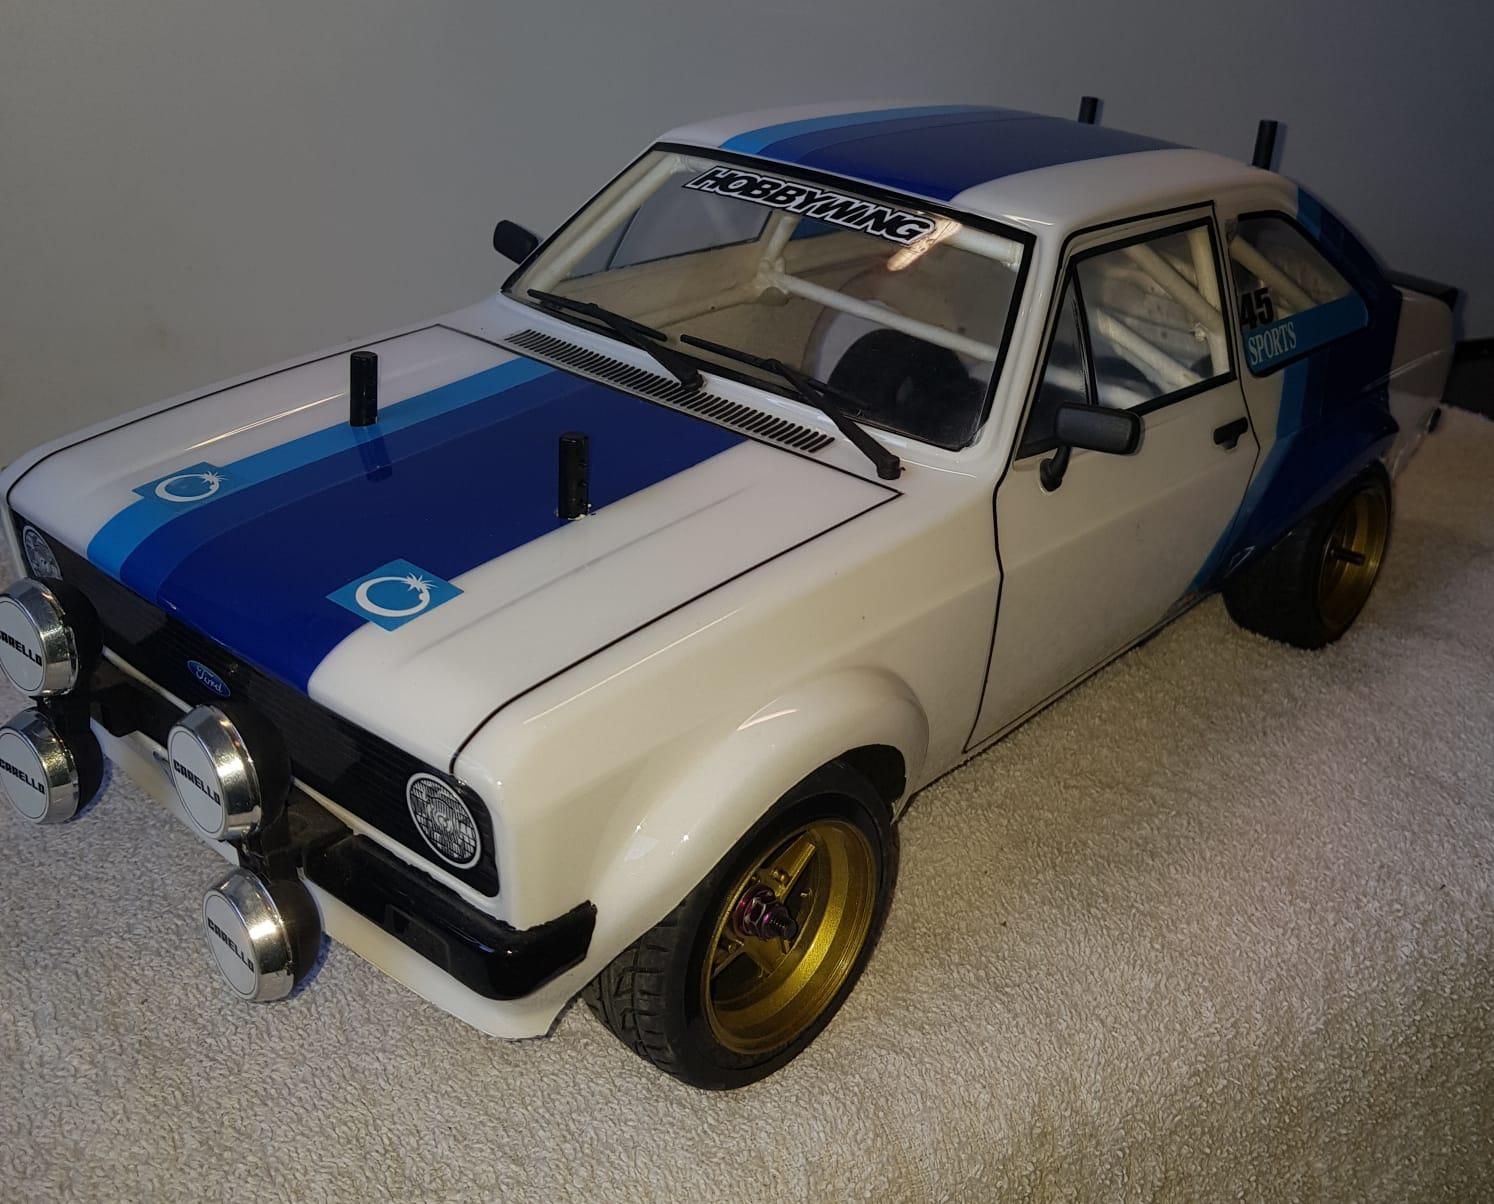 Ford Escort Rally